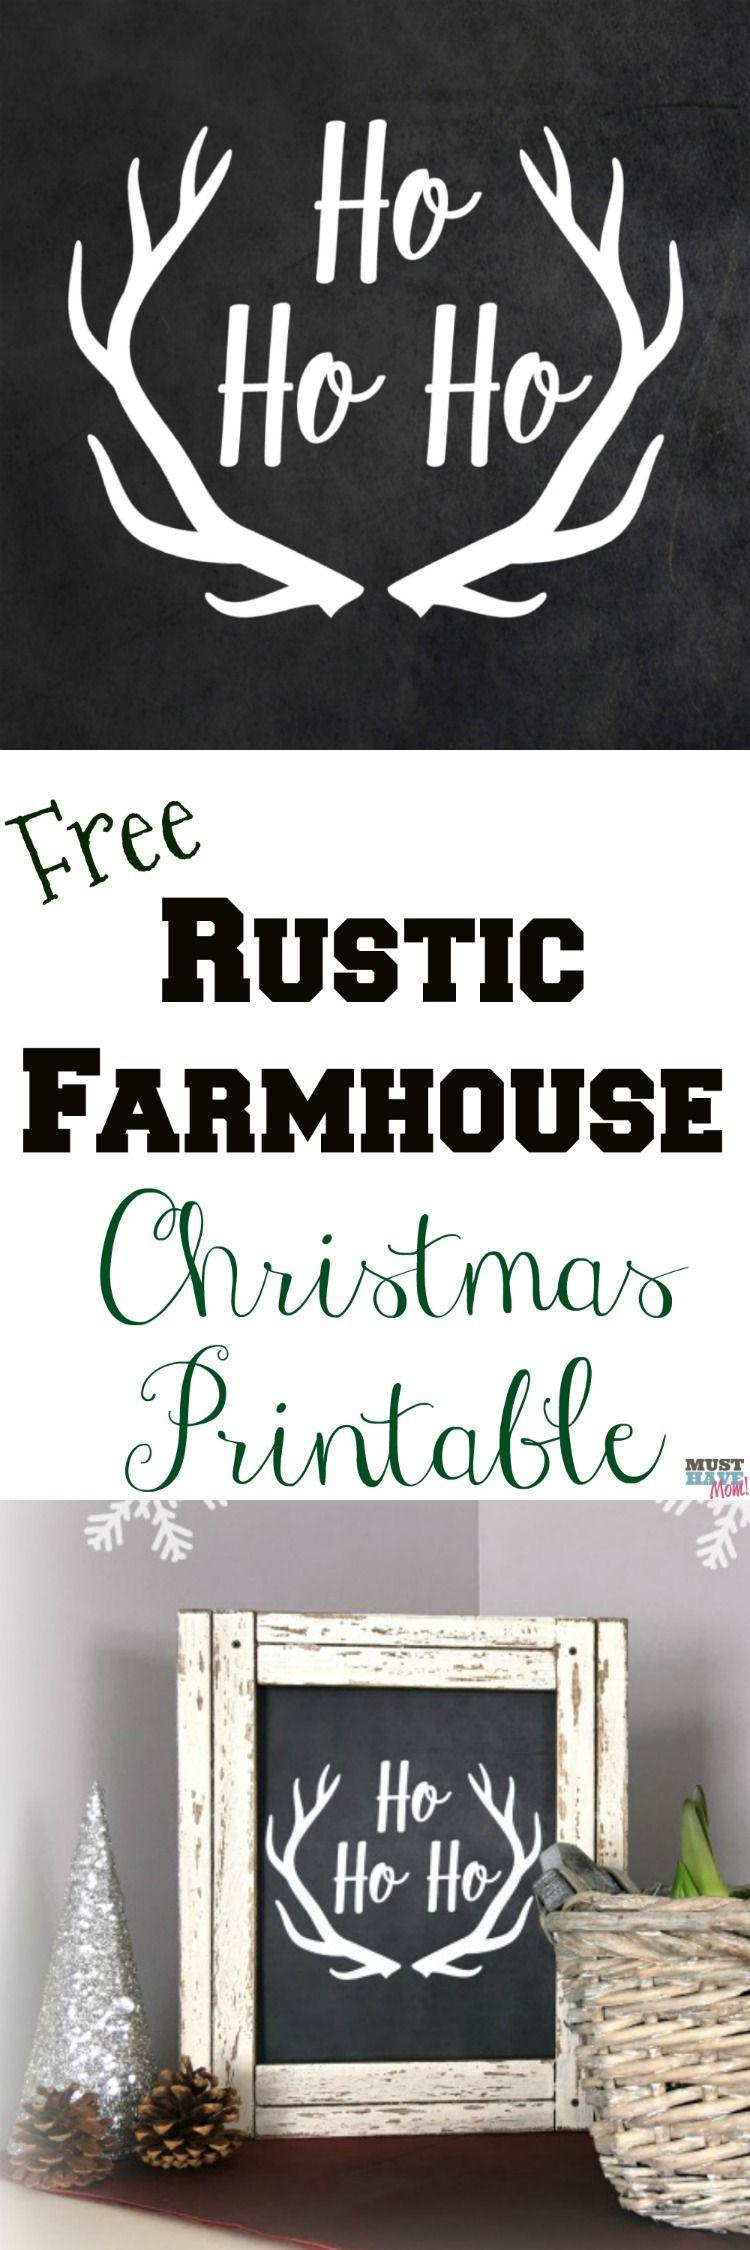 Free rustic farmhouse Christmas printable! Love this